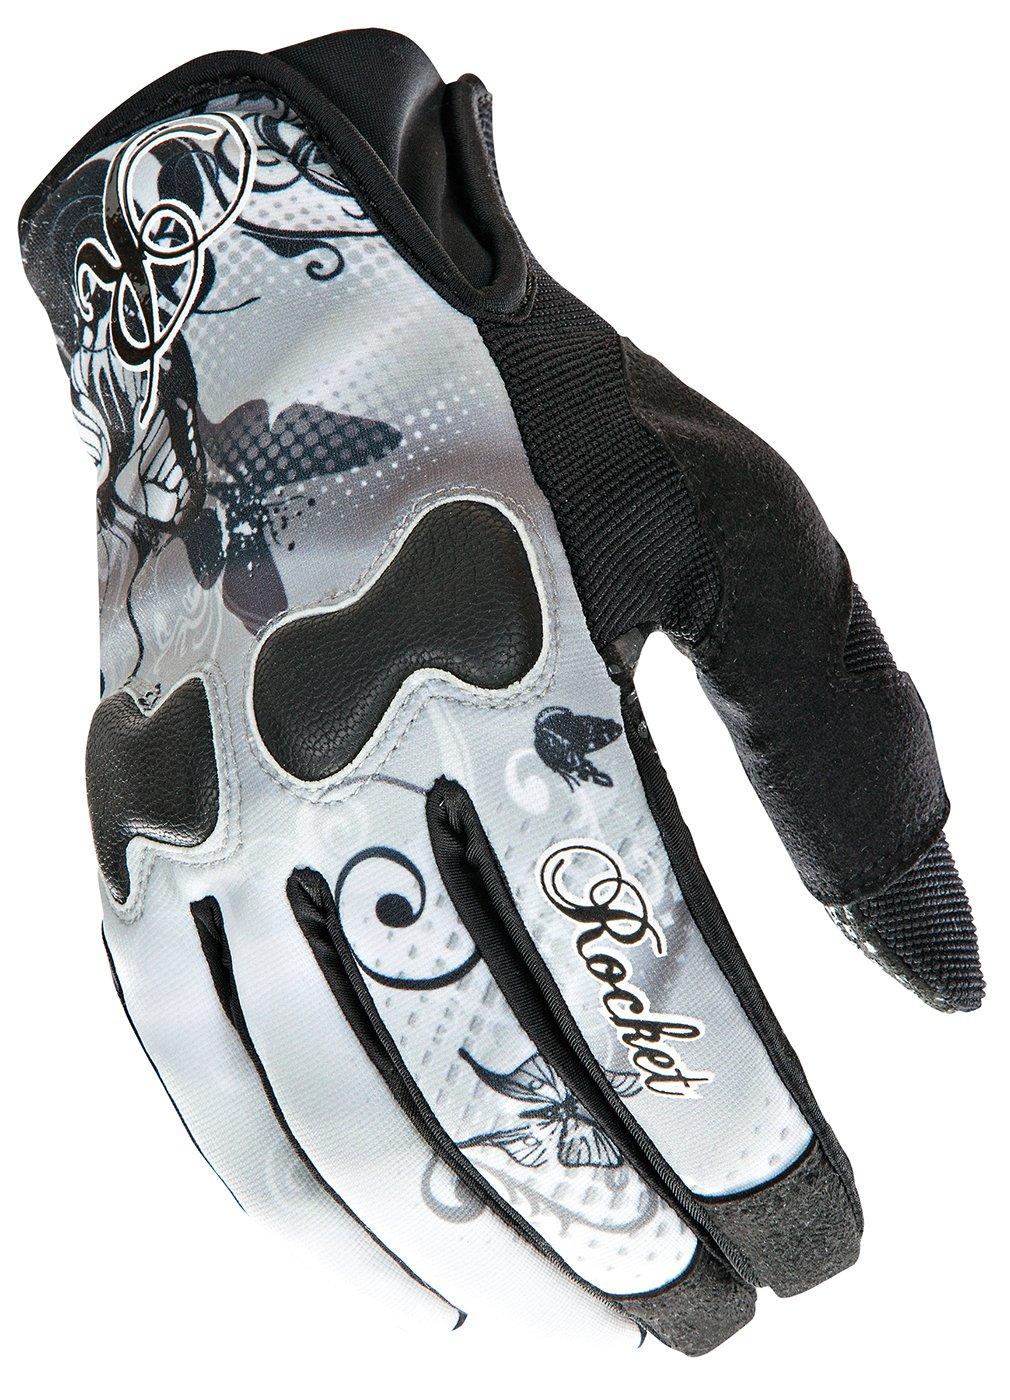 Joe Rocket Nation Women White/Black Textile Motorcycle Gloves - Large